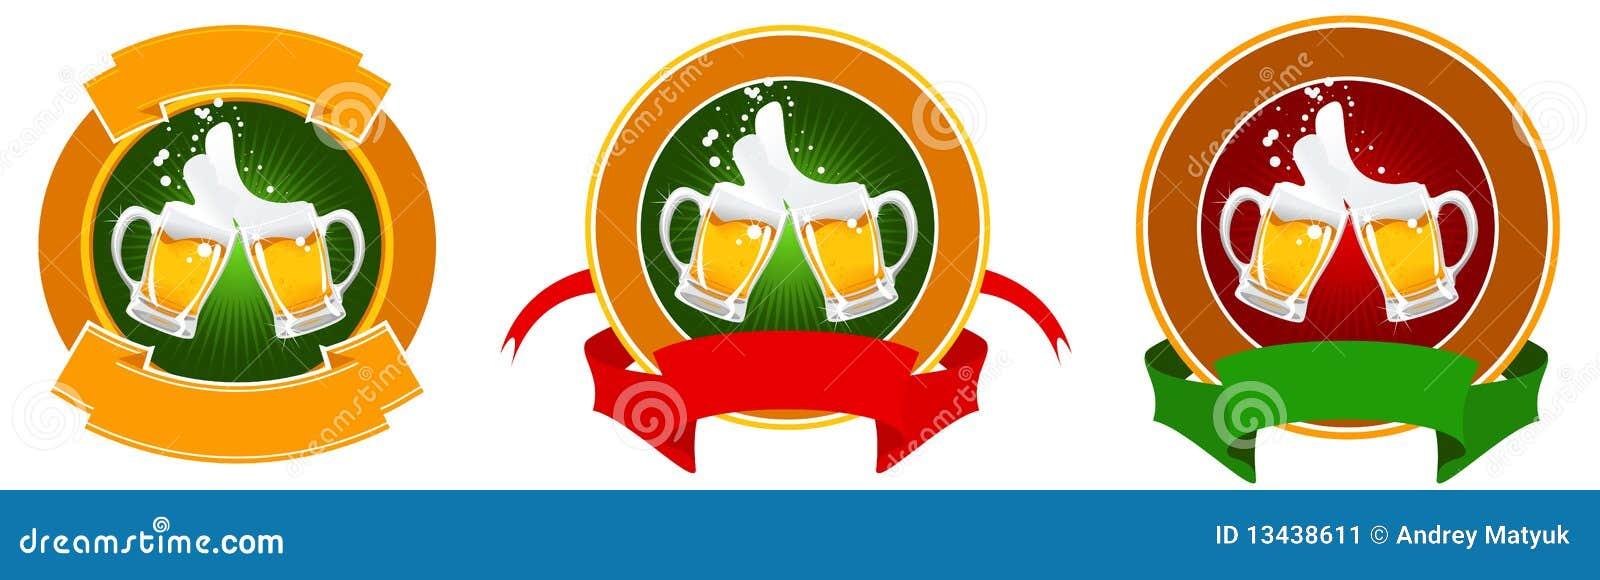 Ontwerp van bieretiket stock afbeelding afbeelding 13438611 - Separateur van stuk ontwerp ...